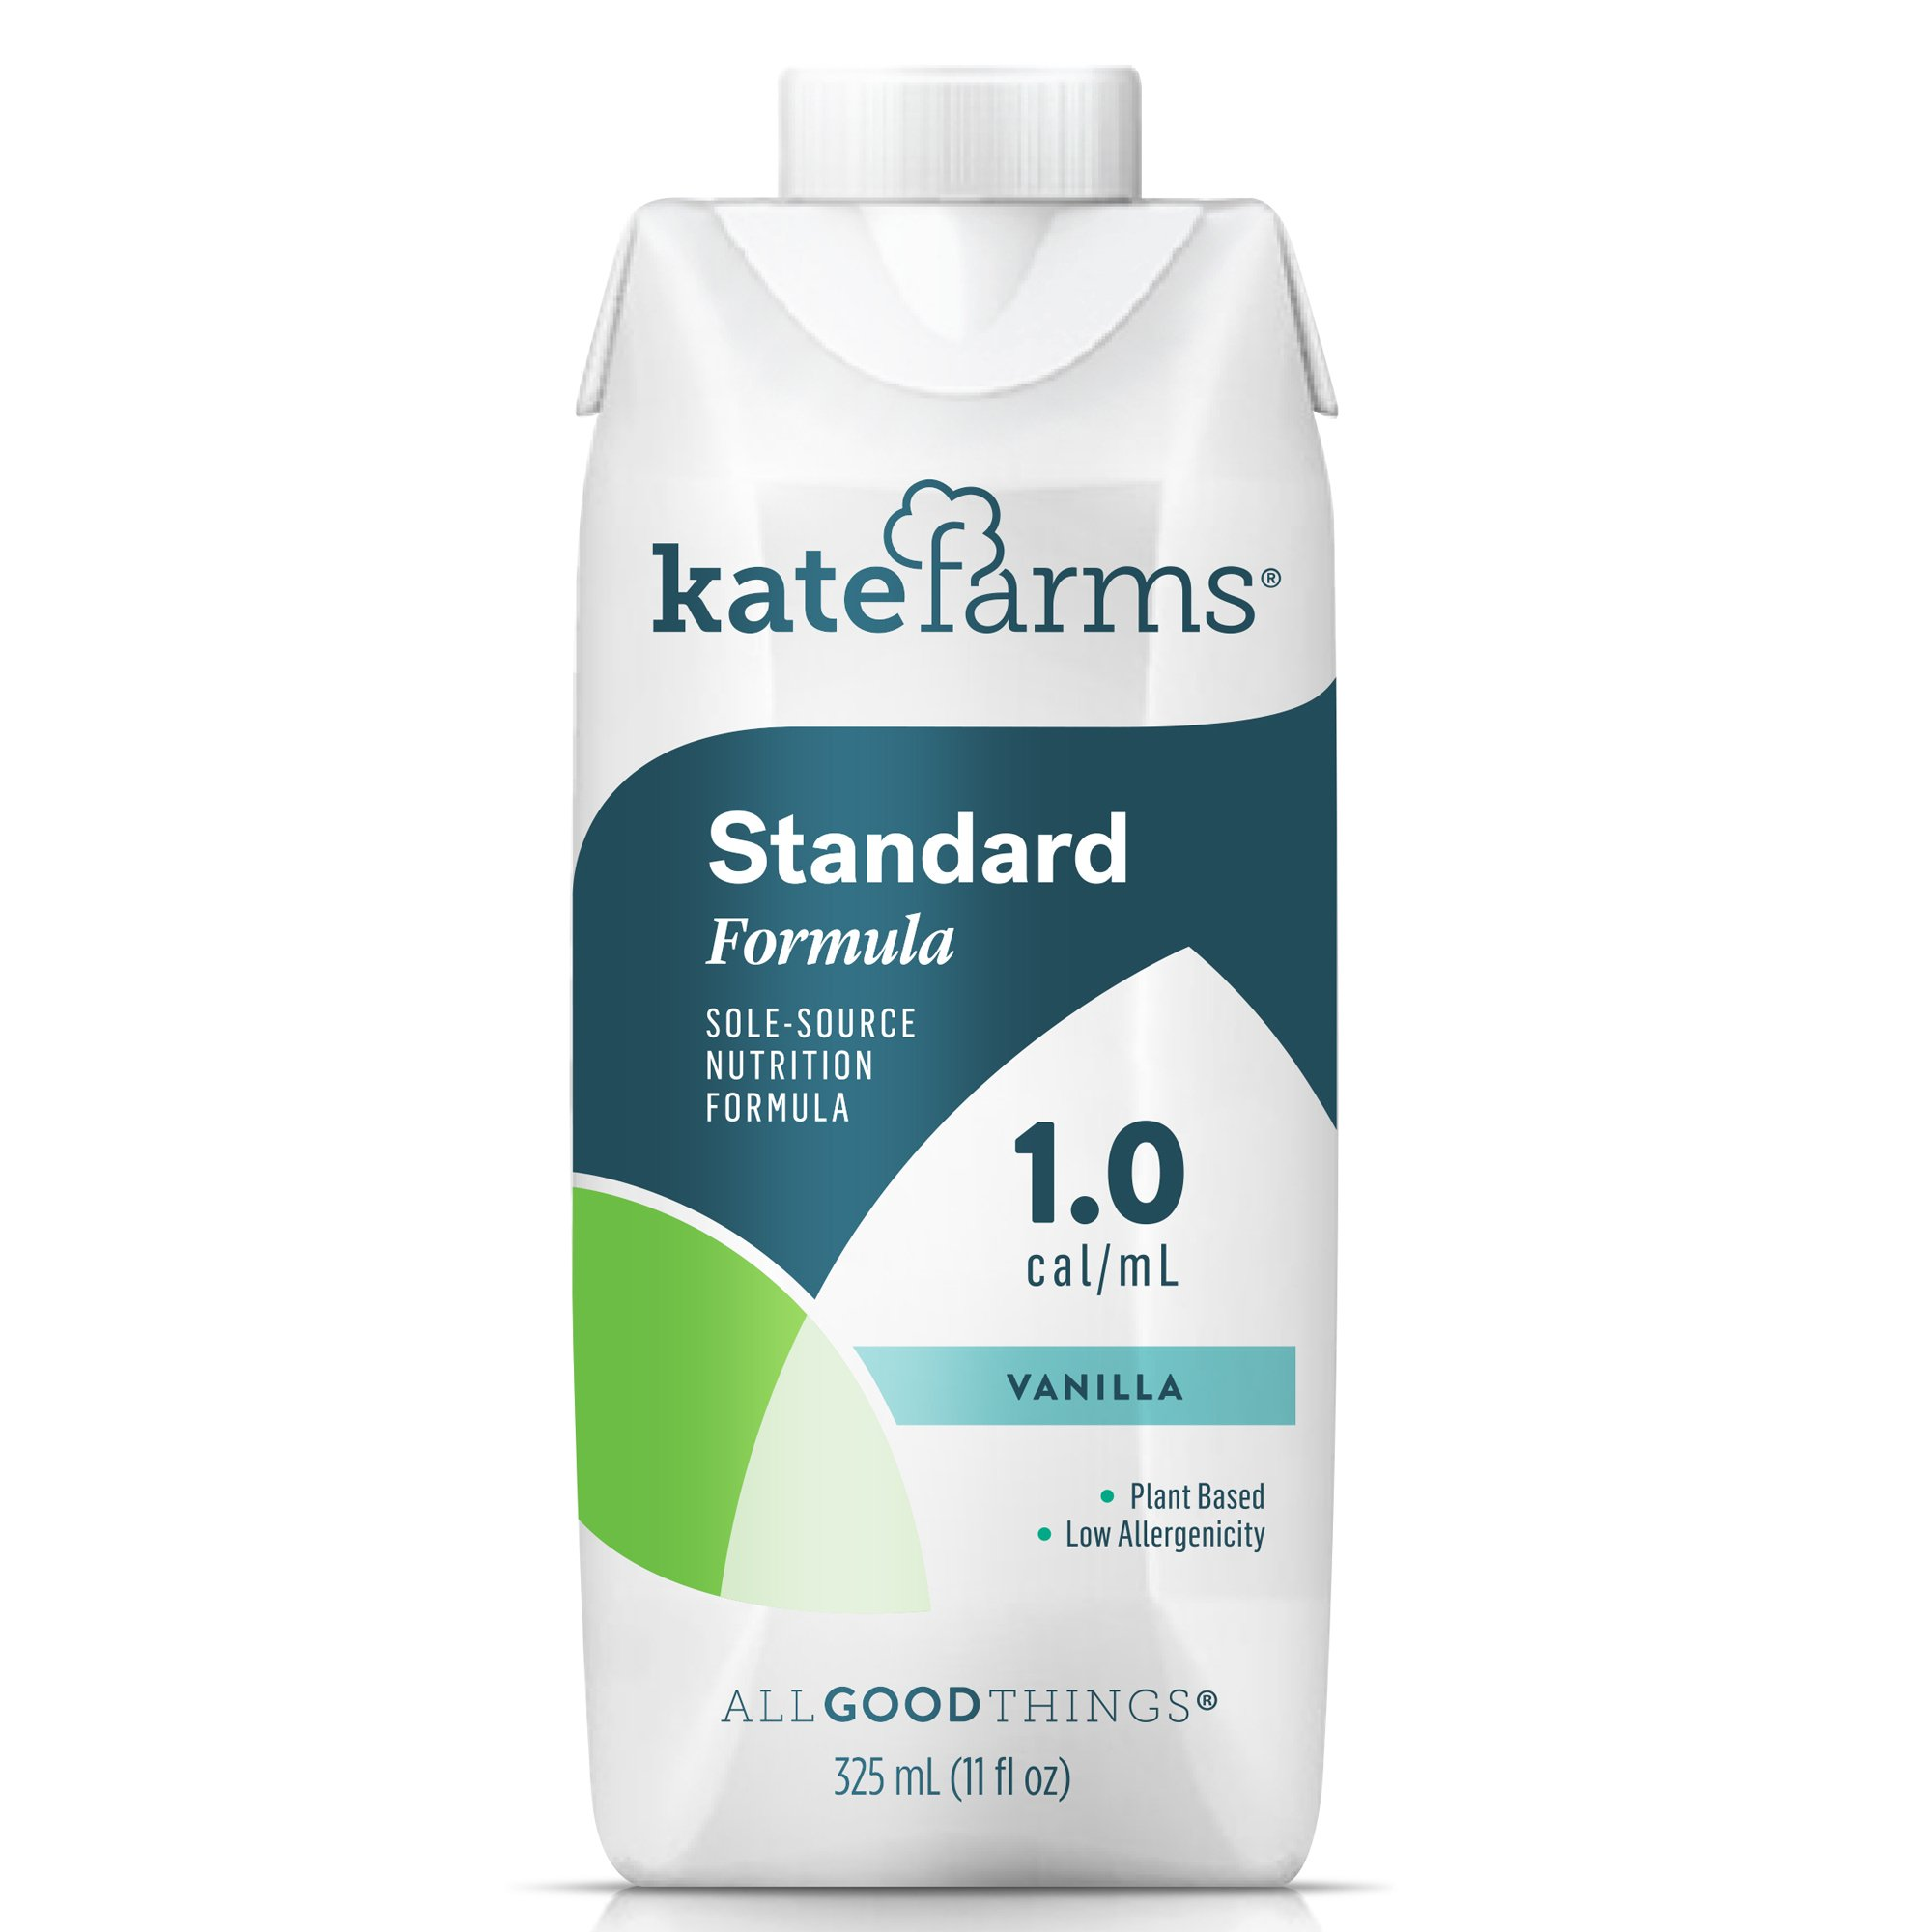 Kate Farms Standard 1 0 Oral Tube Feeding Formula 11 Oz Carton Walmart Com Walmart Com